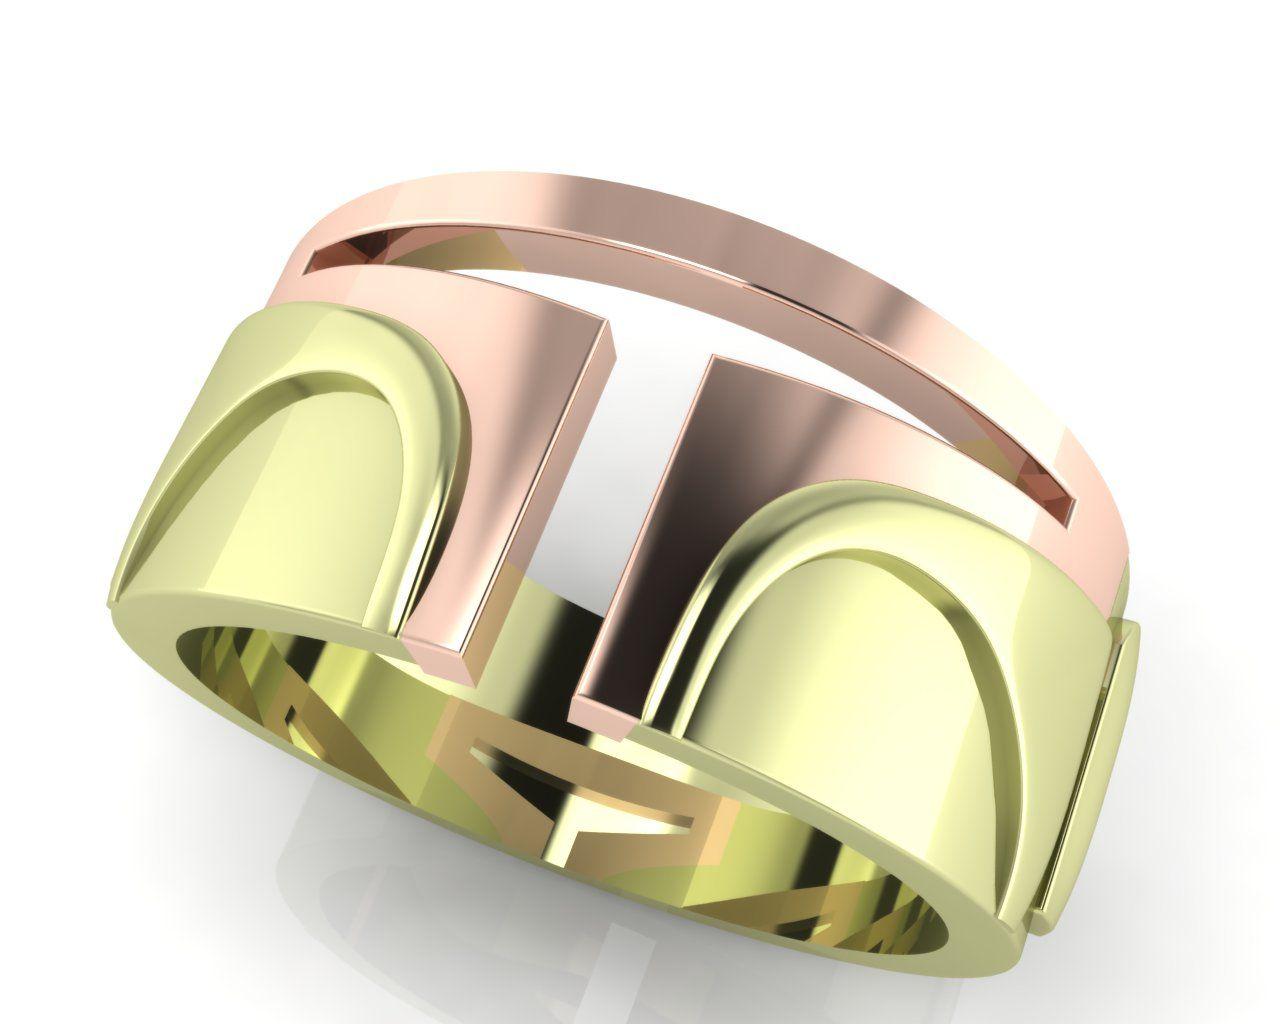 star wars wedding rings Boba Fett Star Wars engagement ring from Brilliant Earth